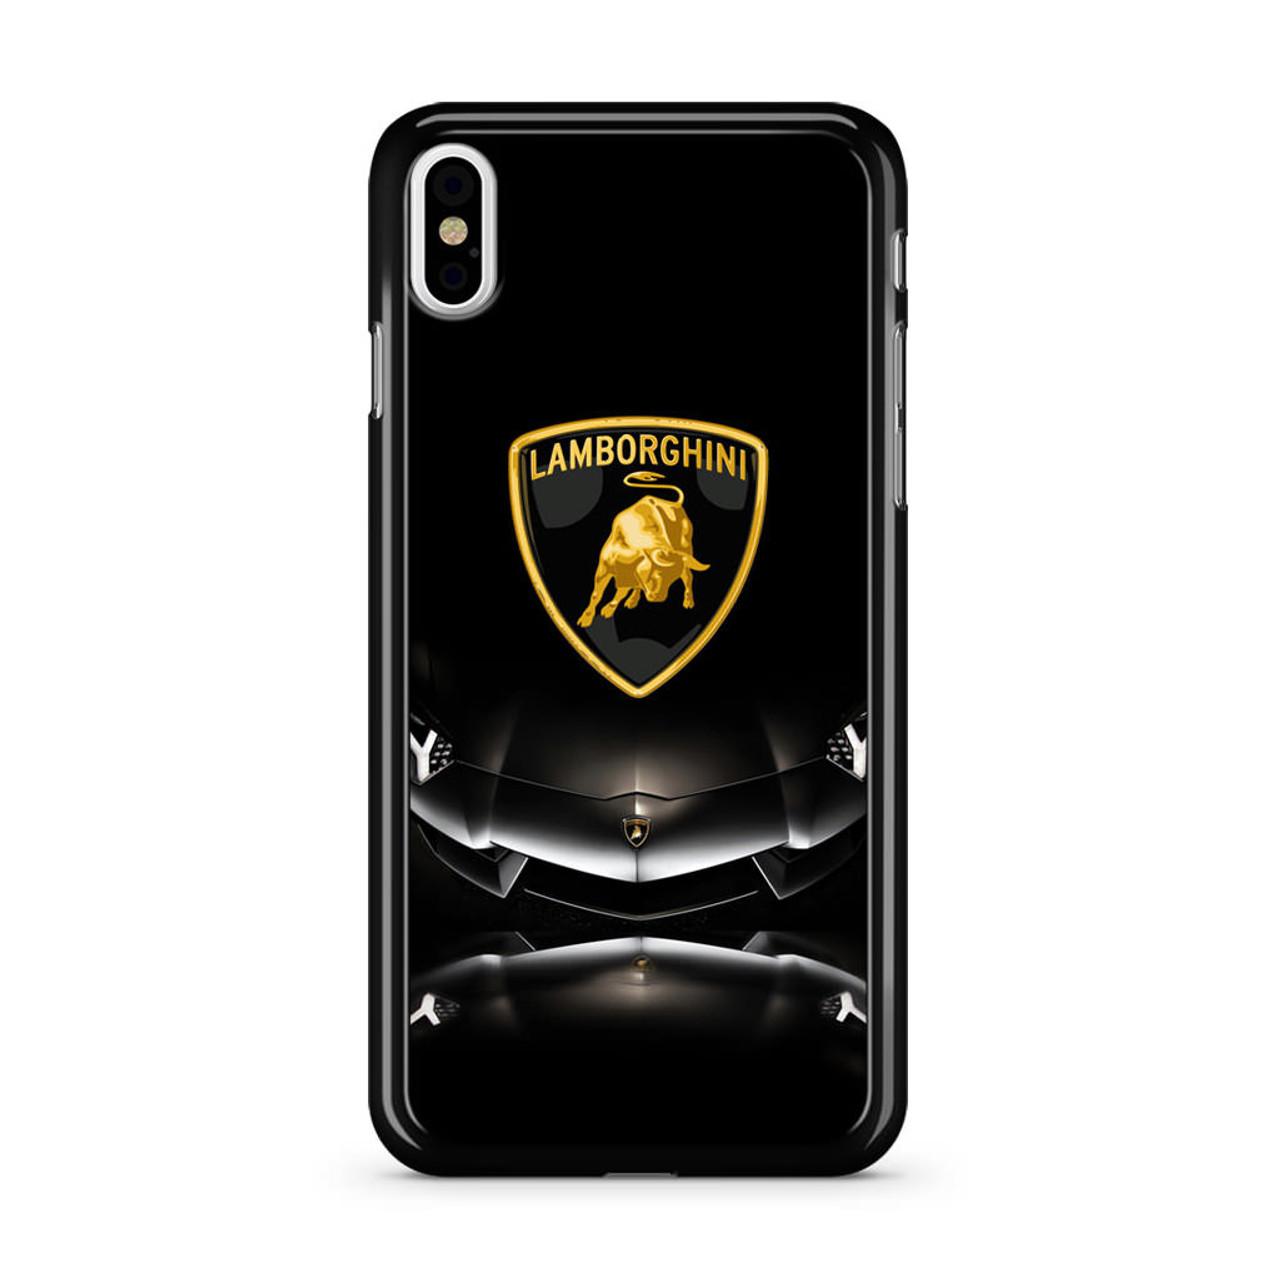 new arrival d2b36 f7c00 Lamborghini iPhone X Case